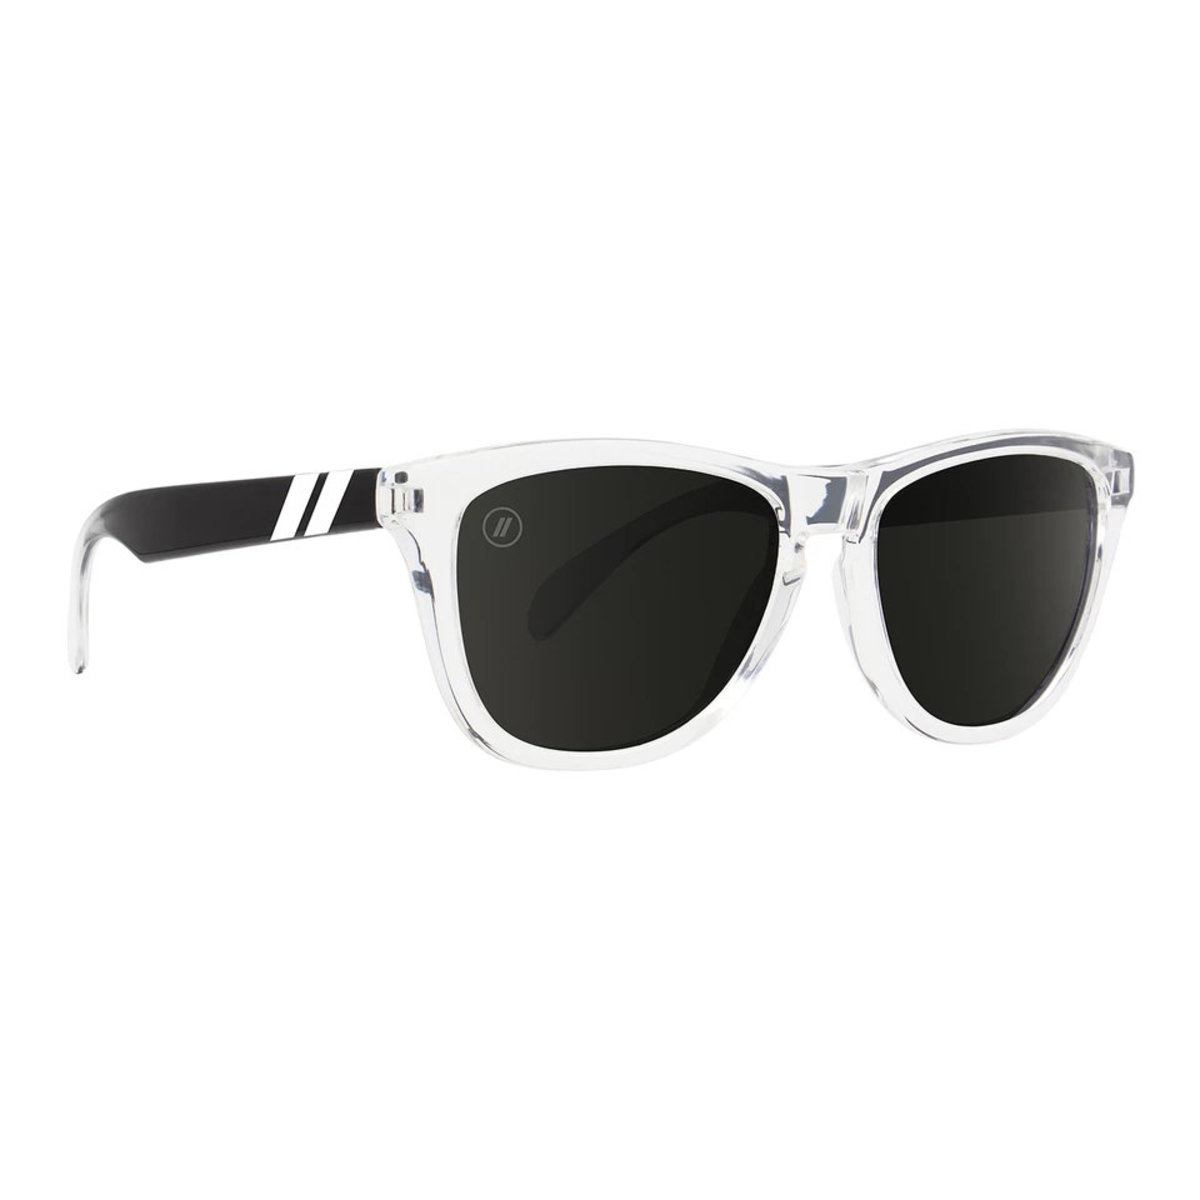 L Series // 偏光鏡片黑白漸變梯形鏡框太陽眼鏡